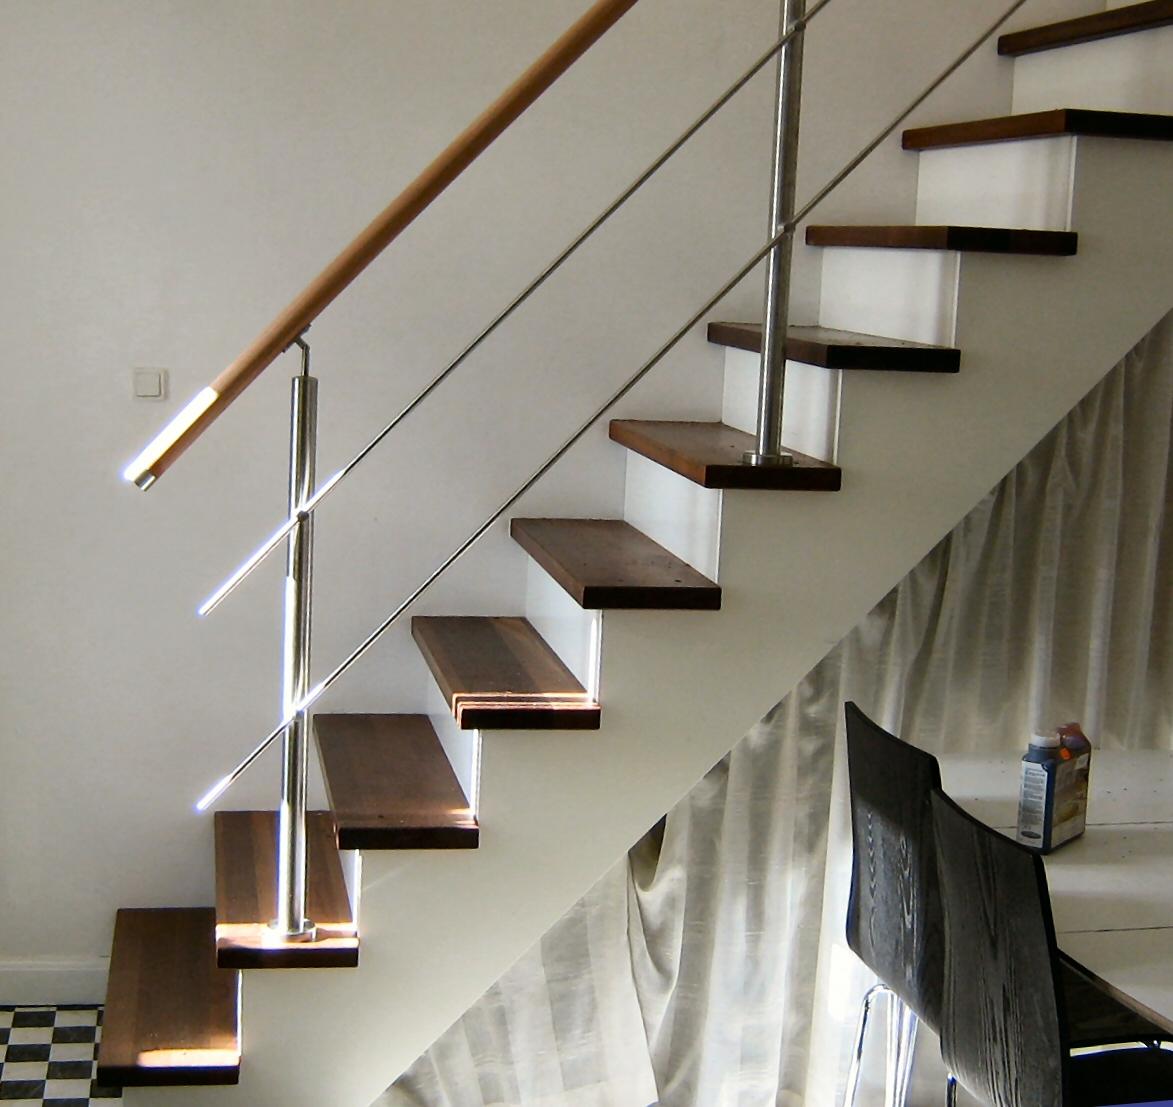 gel nder rustfrie gel nder galv gel nder trappe gel nder glas gel nder gel nder trappe. Black Bedroom Furniture Sets. Home Design Ideas